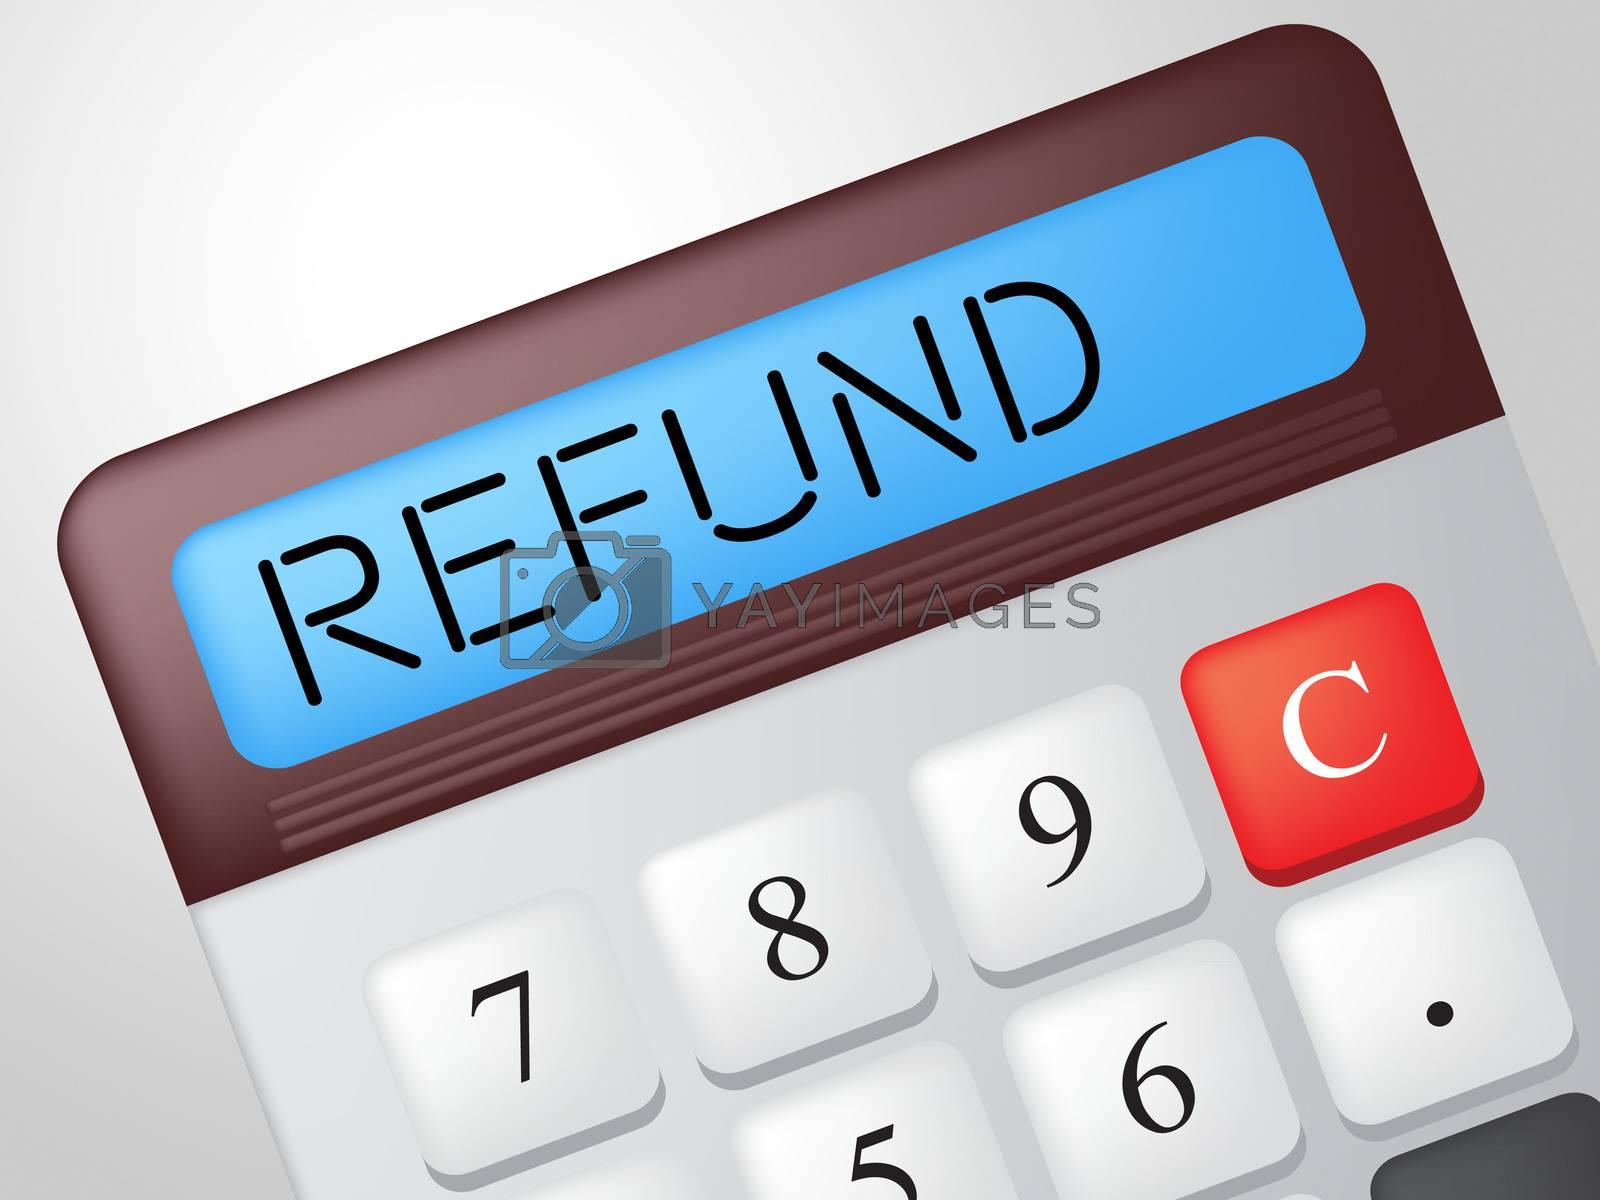 Refund Calculator Means Reimbursement Refunding And Return by stuartmiles